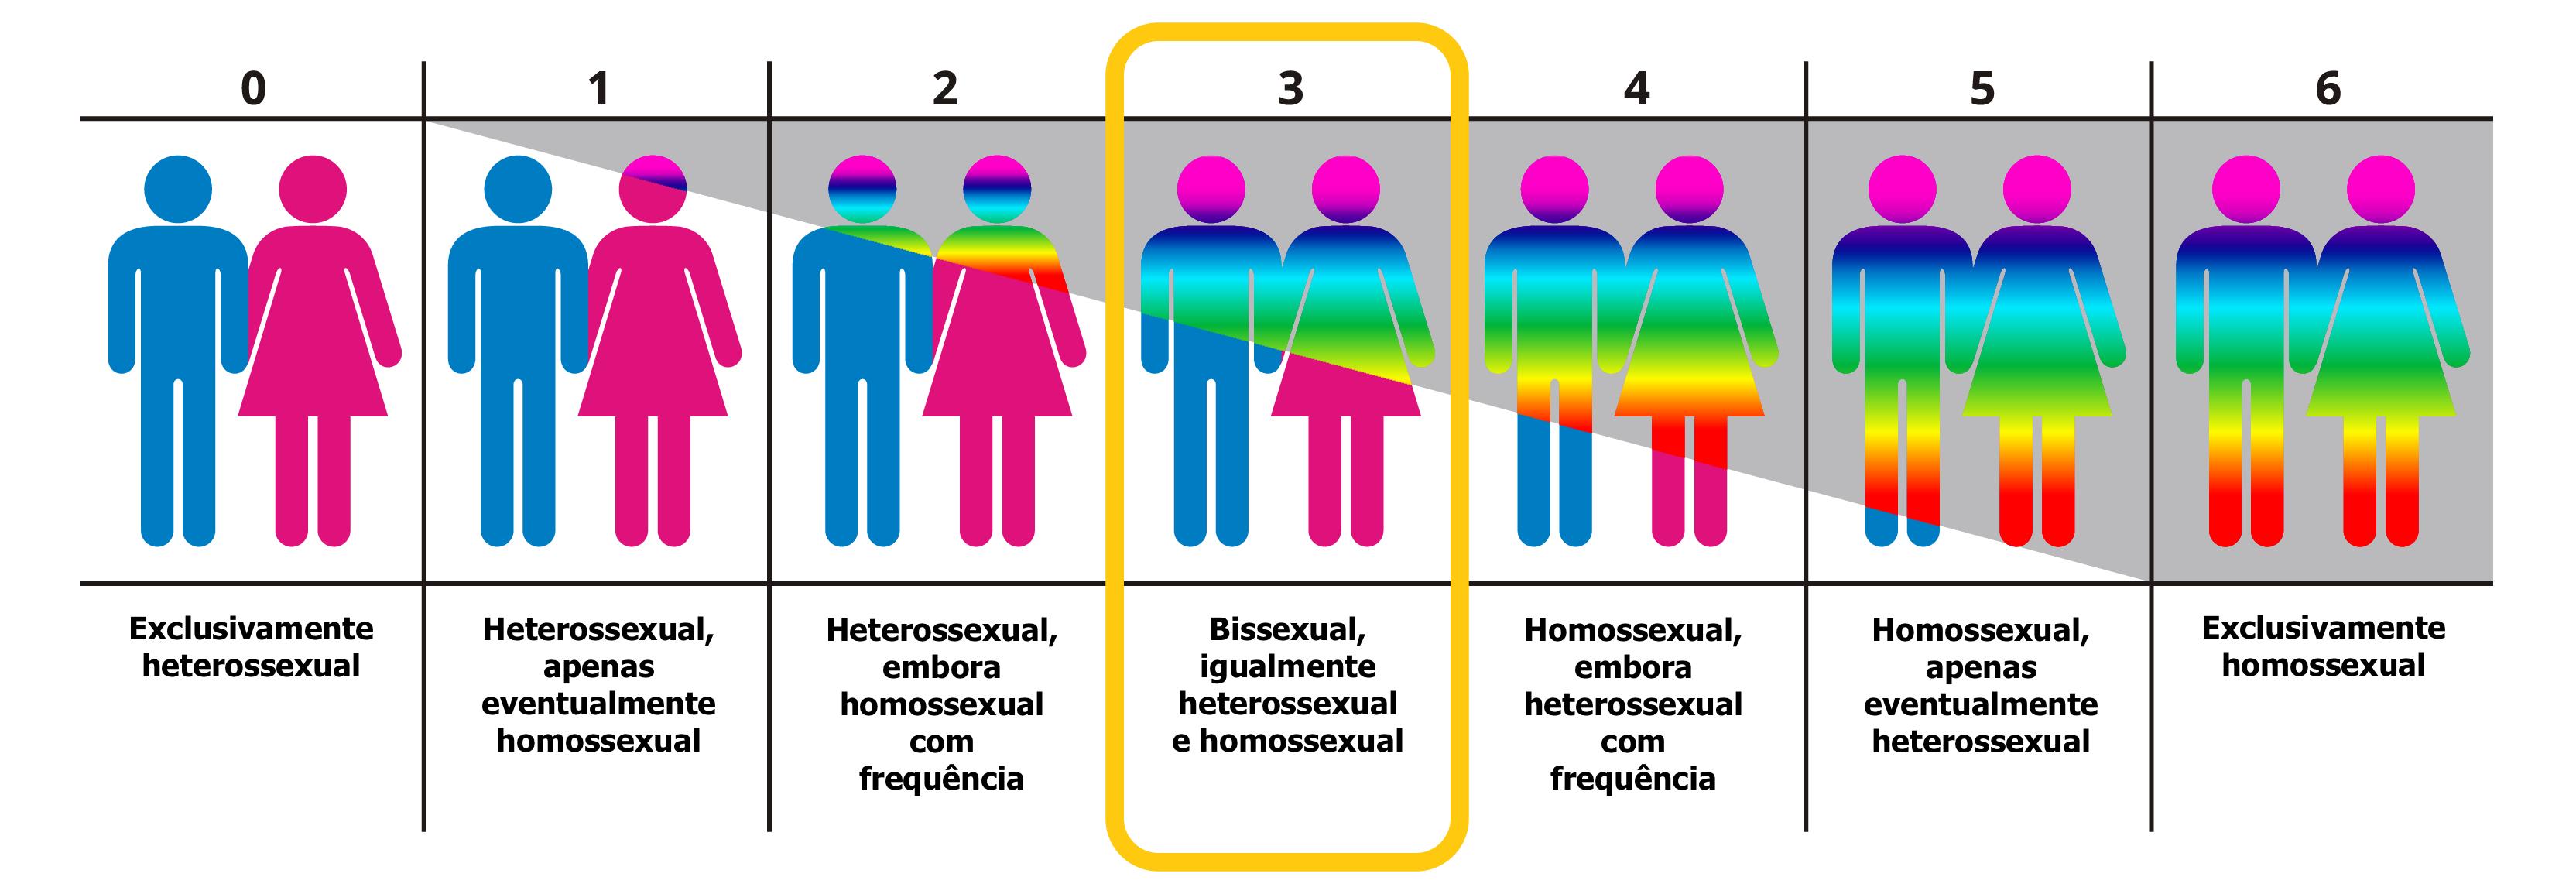 Escala kinsey test of sexual orientation